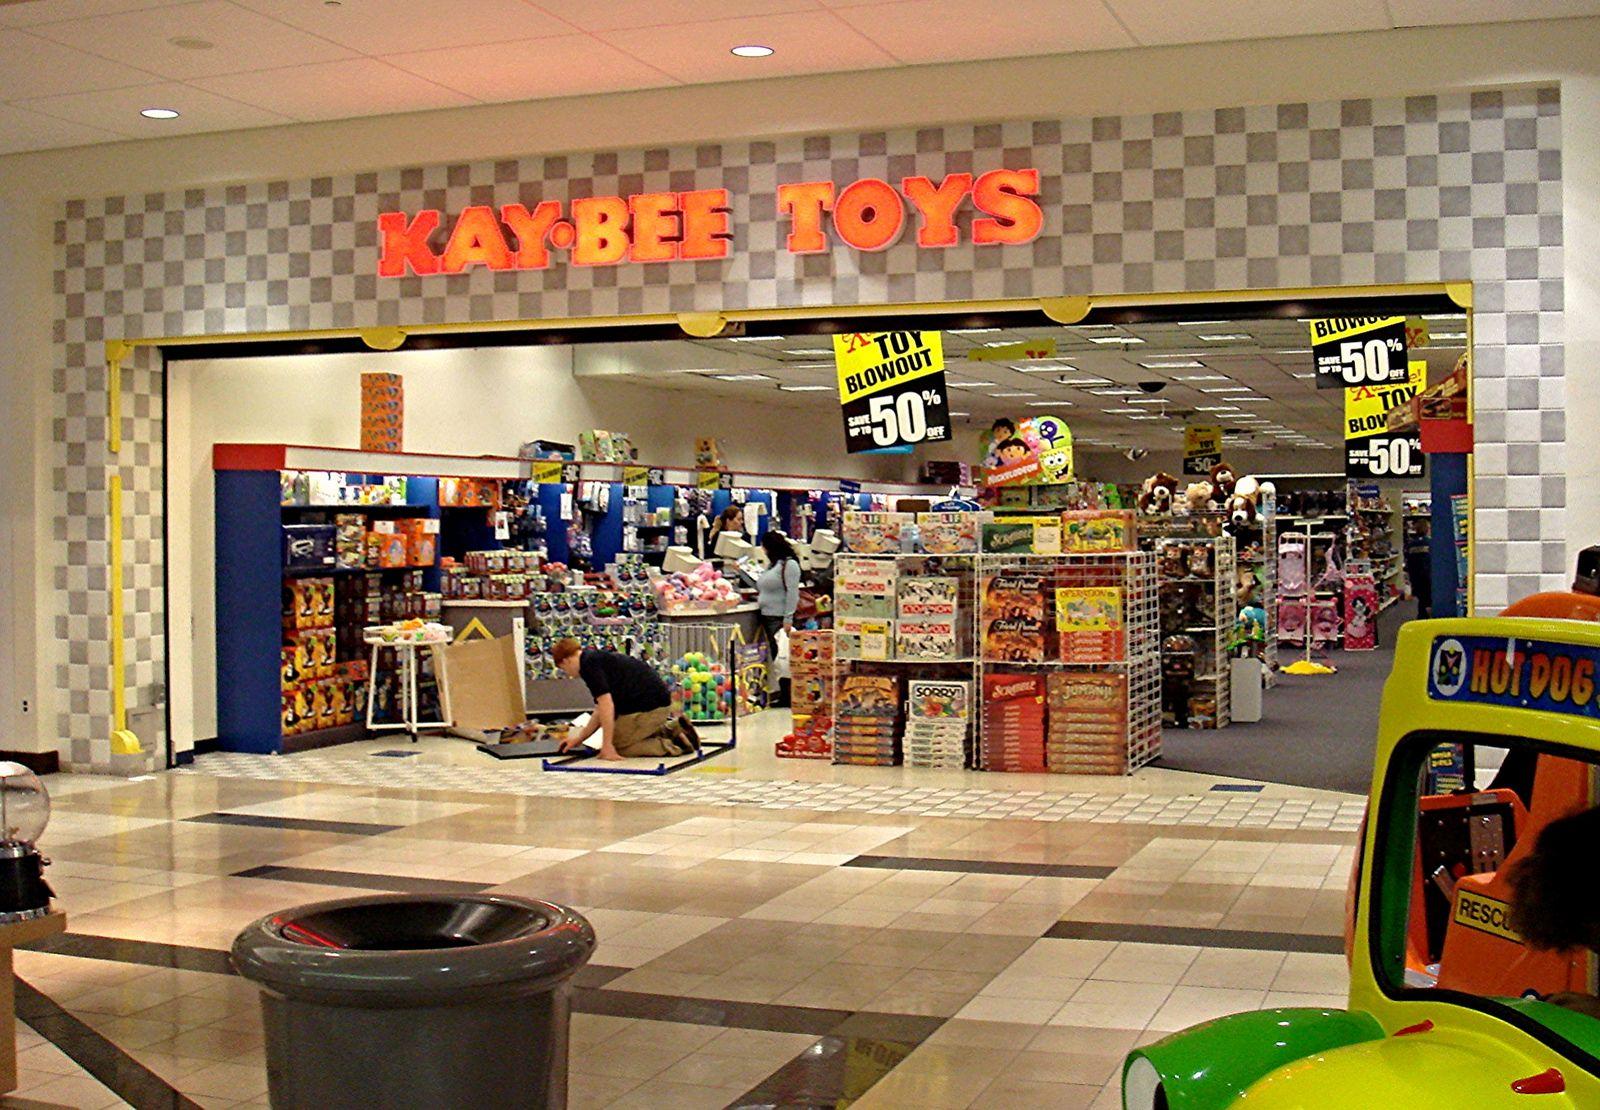 K Bee Toy Store Kay-Bee Toys at Newbur...